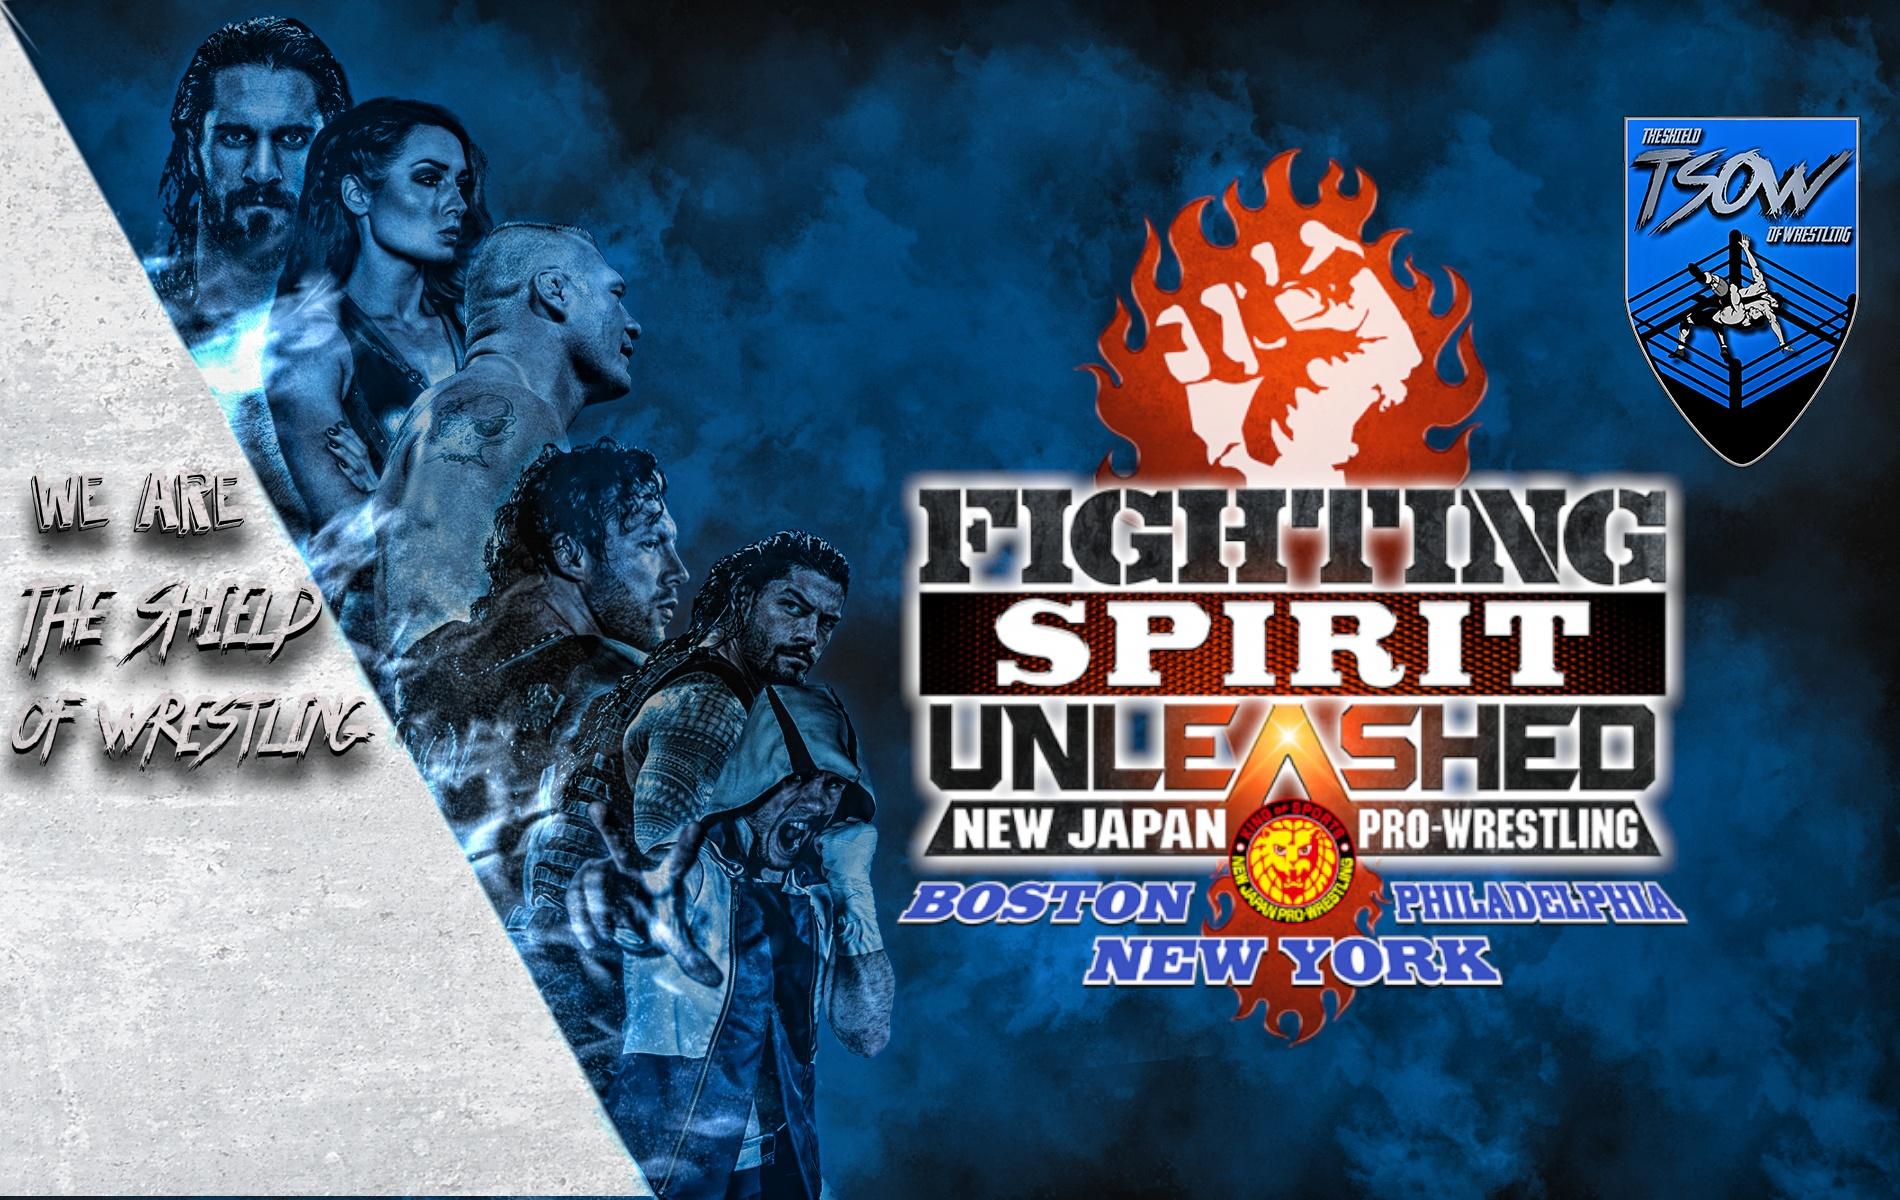 NJPW Fighting Spirit Unleashed - NJPW